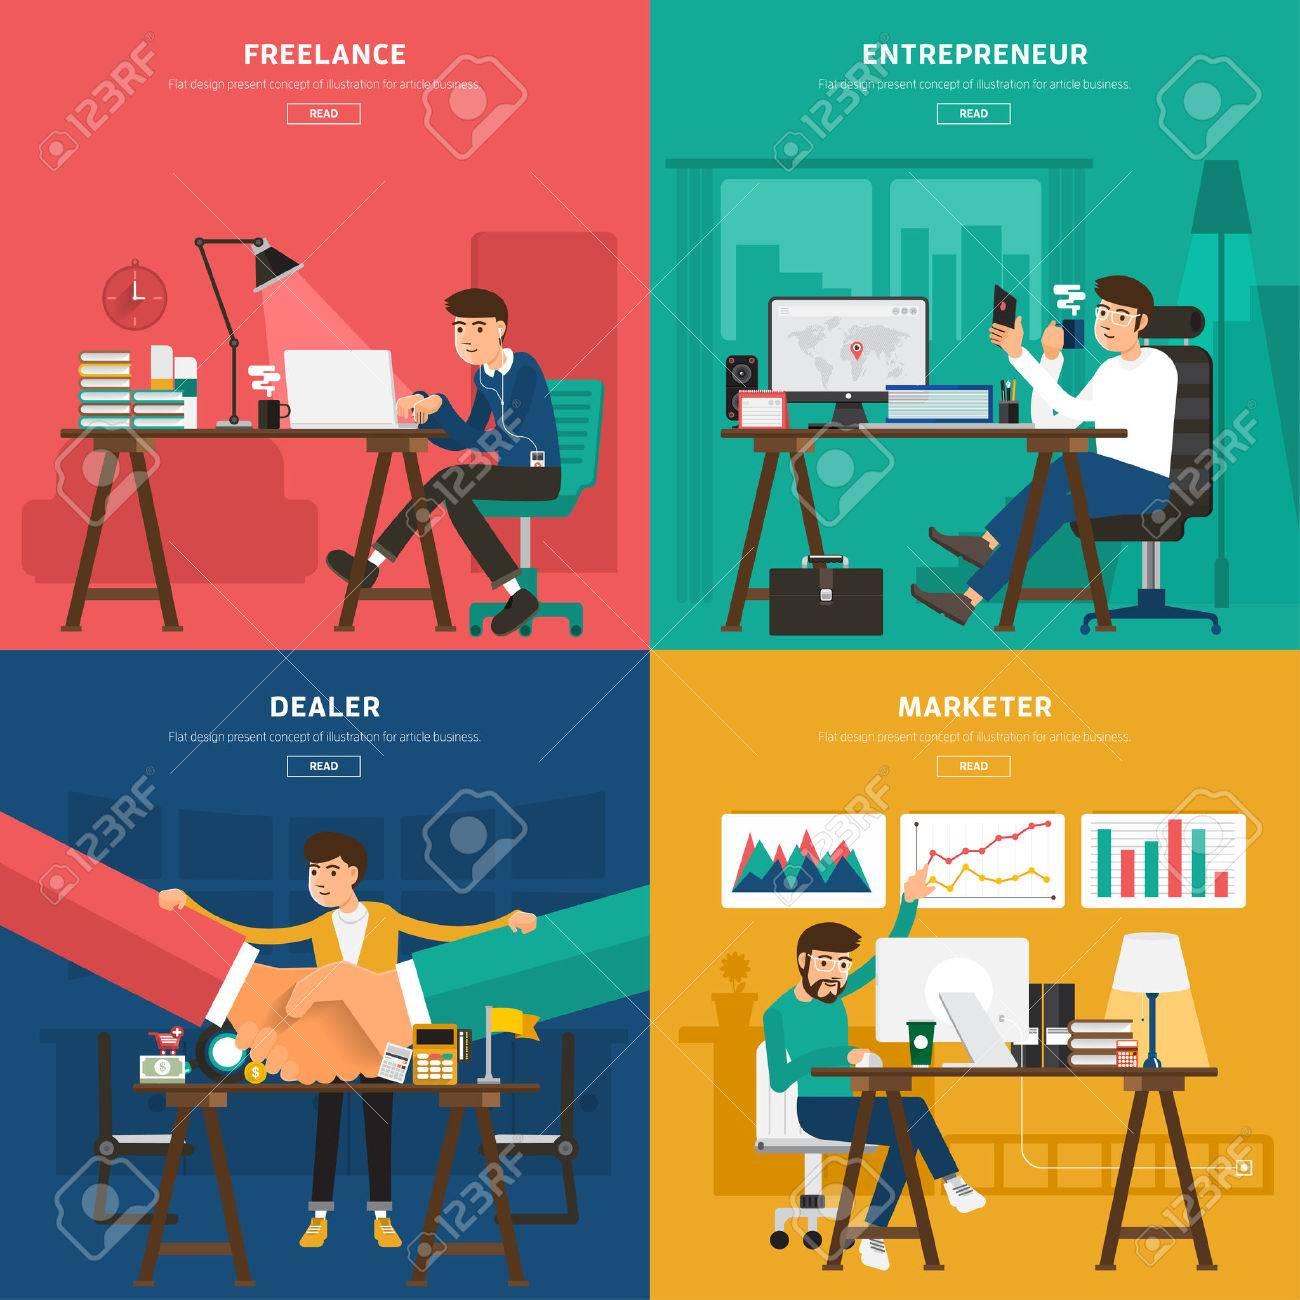 Flat design concept co working center for worker freelance, entrepreneur, dealer, and marketer. Illustrate for banner and article design - 38200263